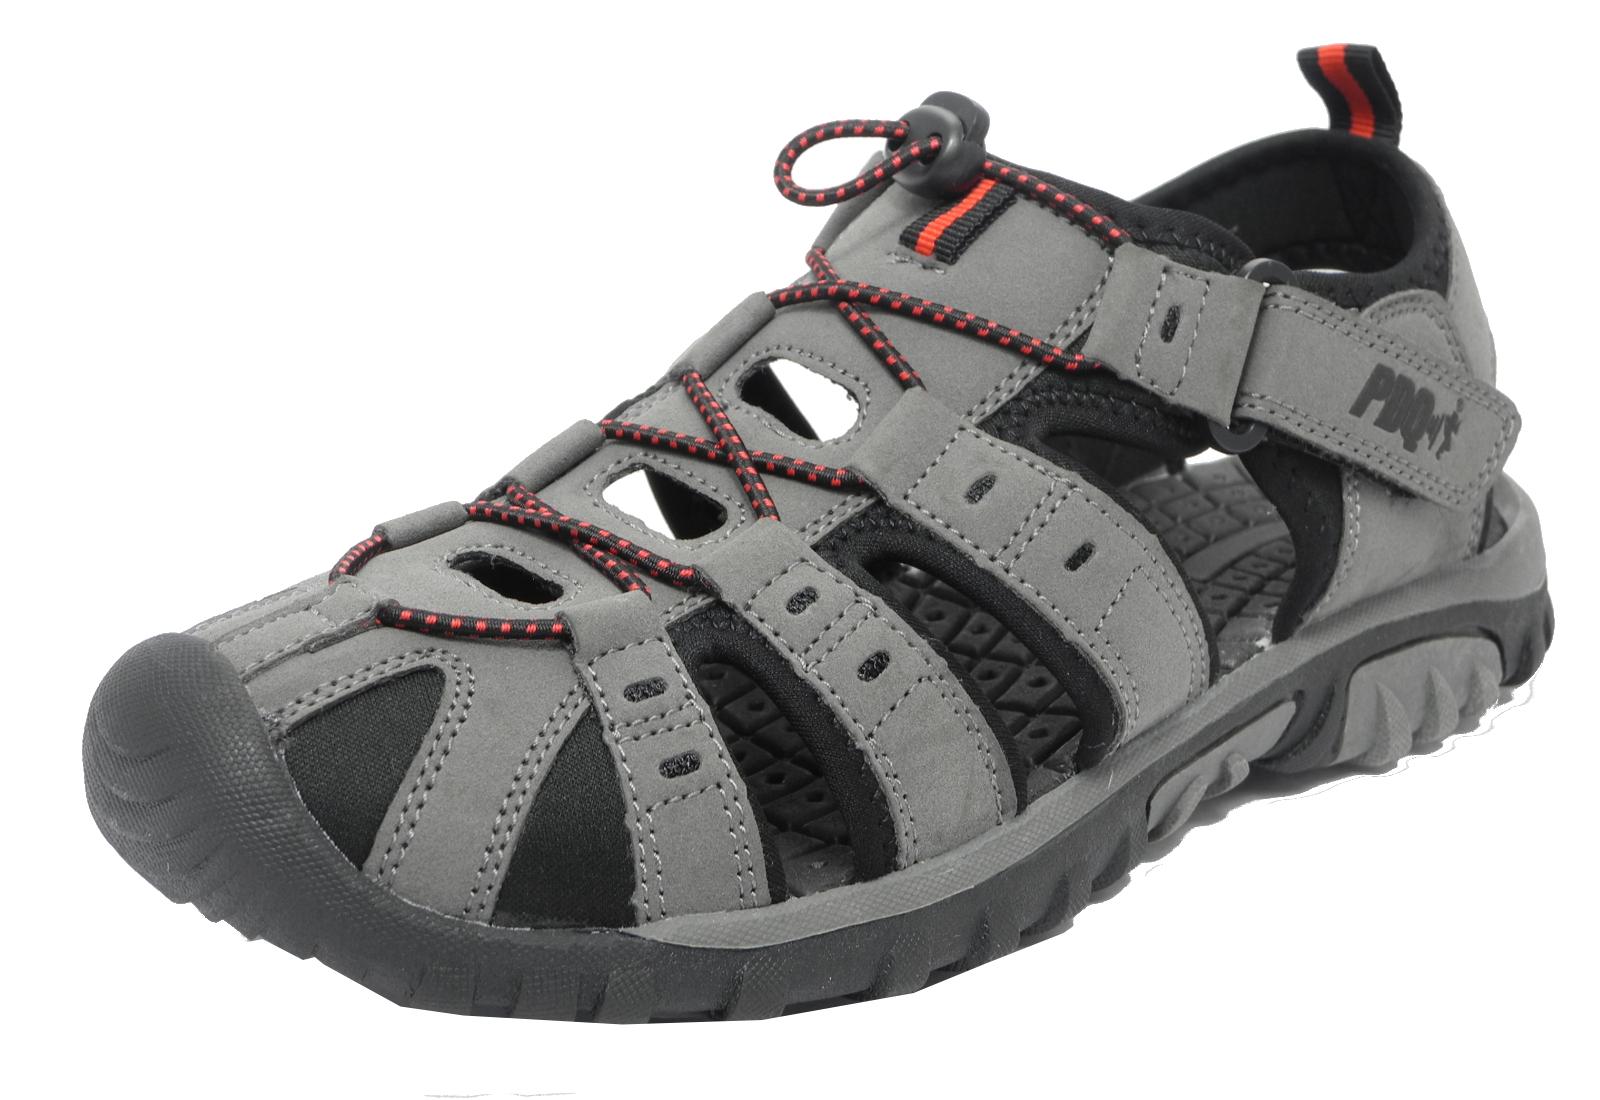 Mens Boys PDQ Sports Hiking Closed Toe Trail Sandals 2 3 4 5 6 7 8 9 10 11 12